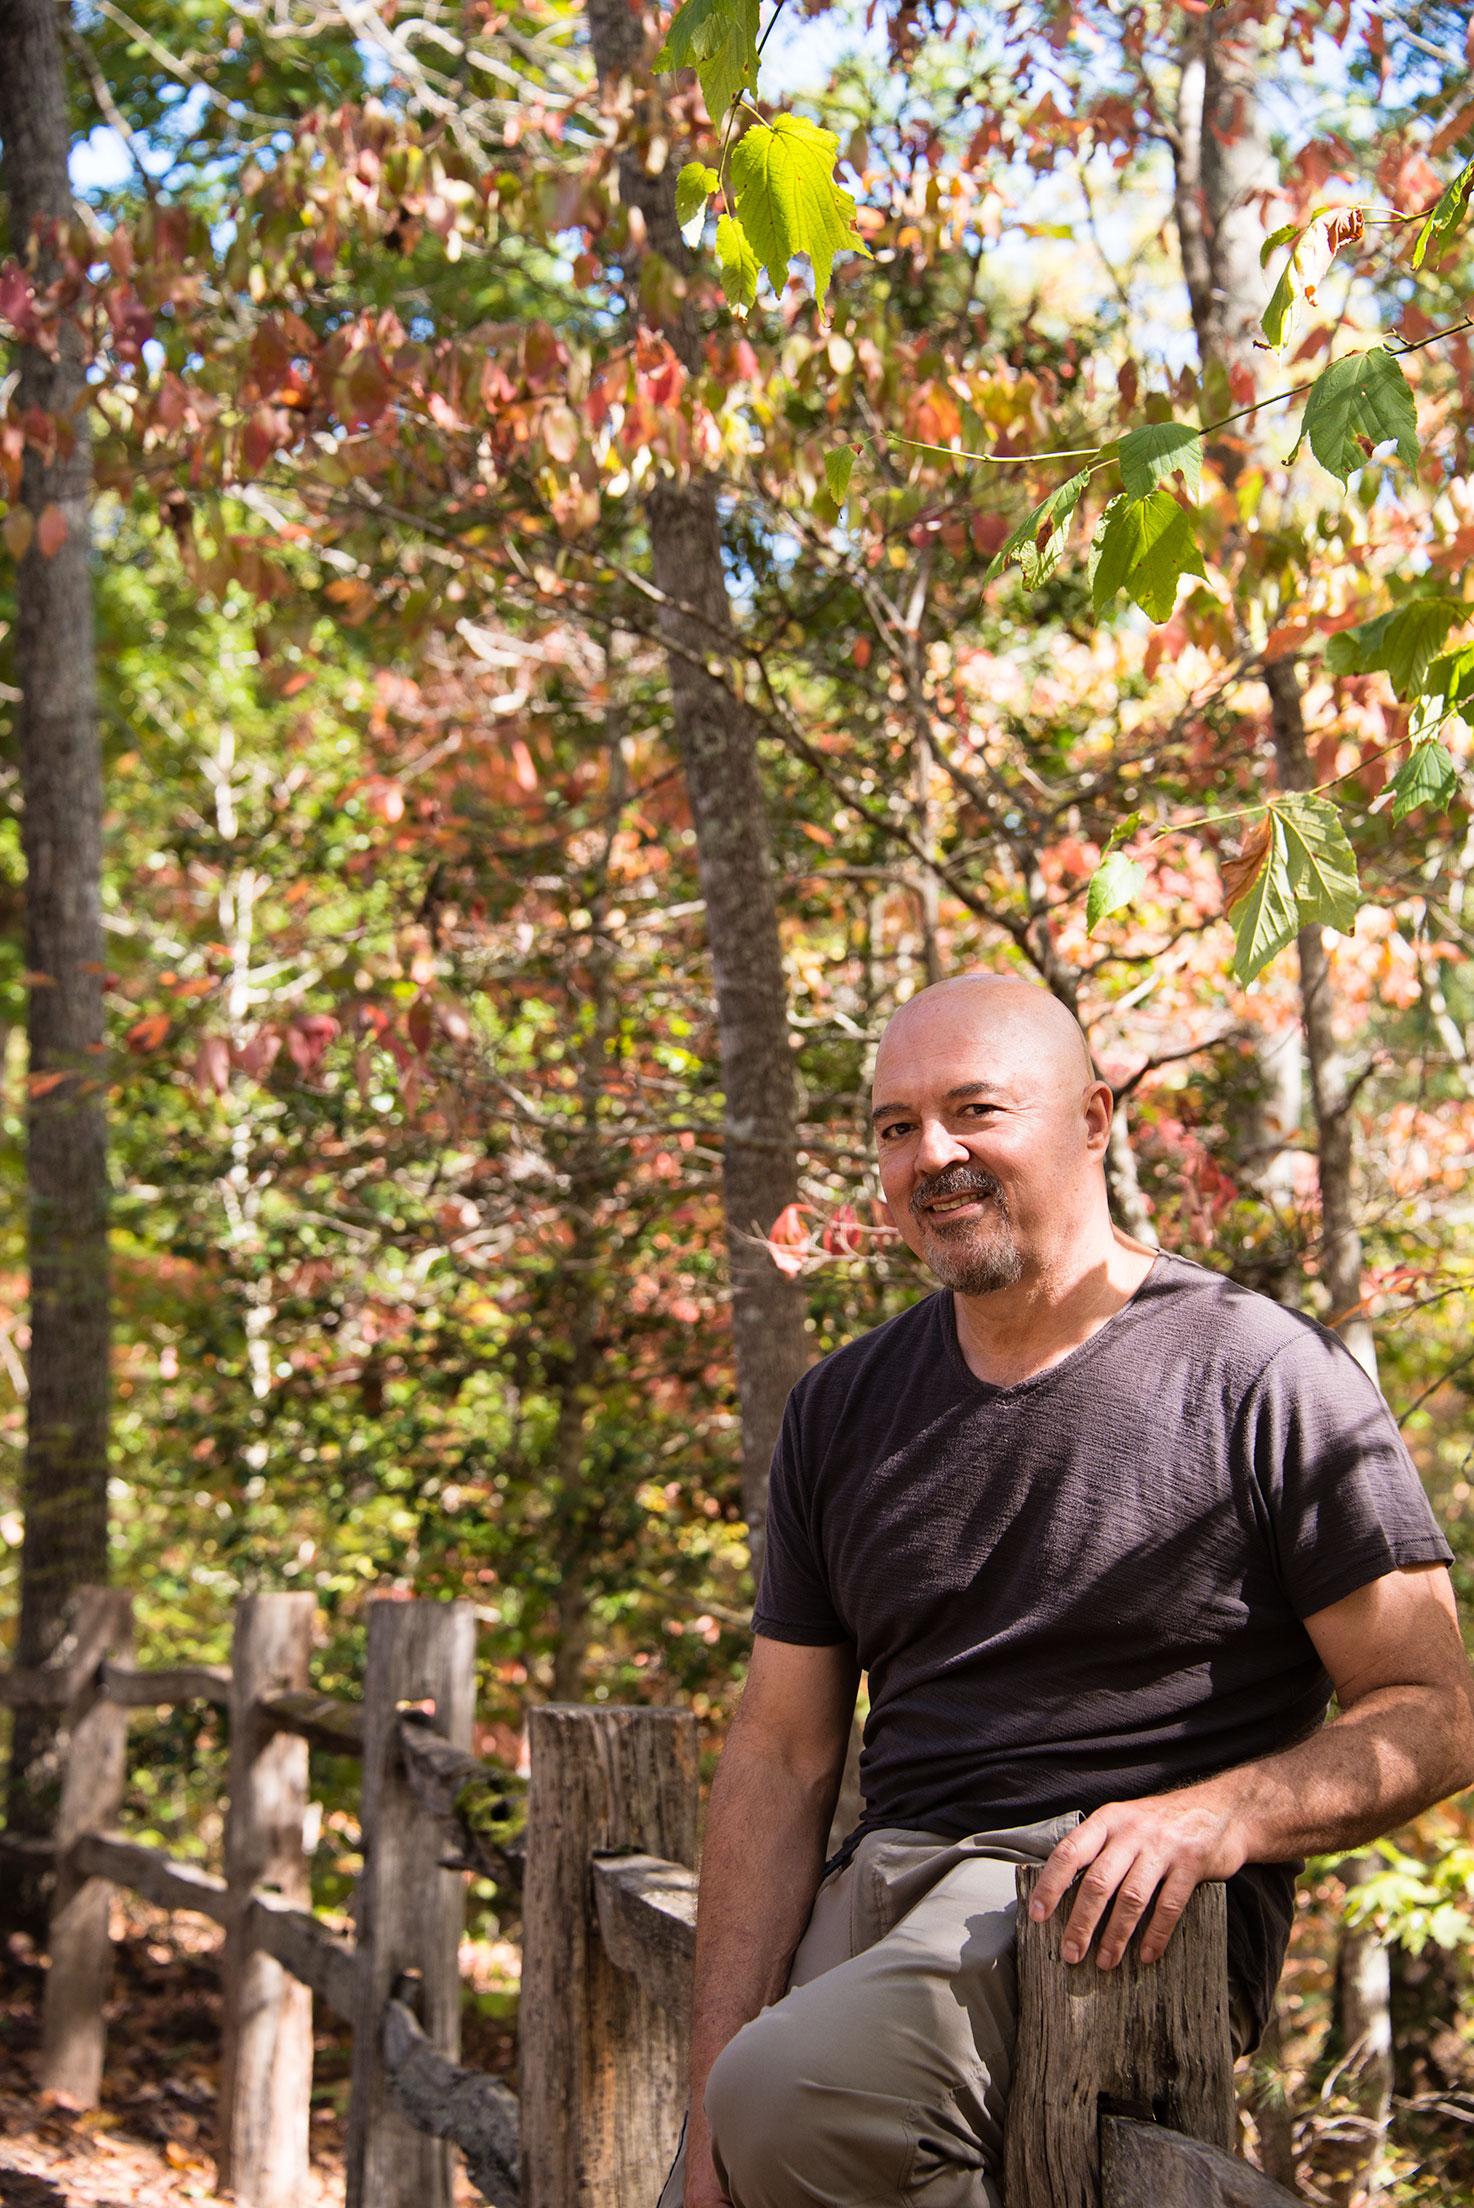 Man in the Woods at the North Carolina Arboretum